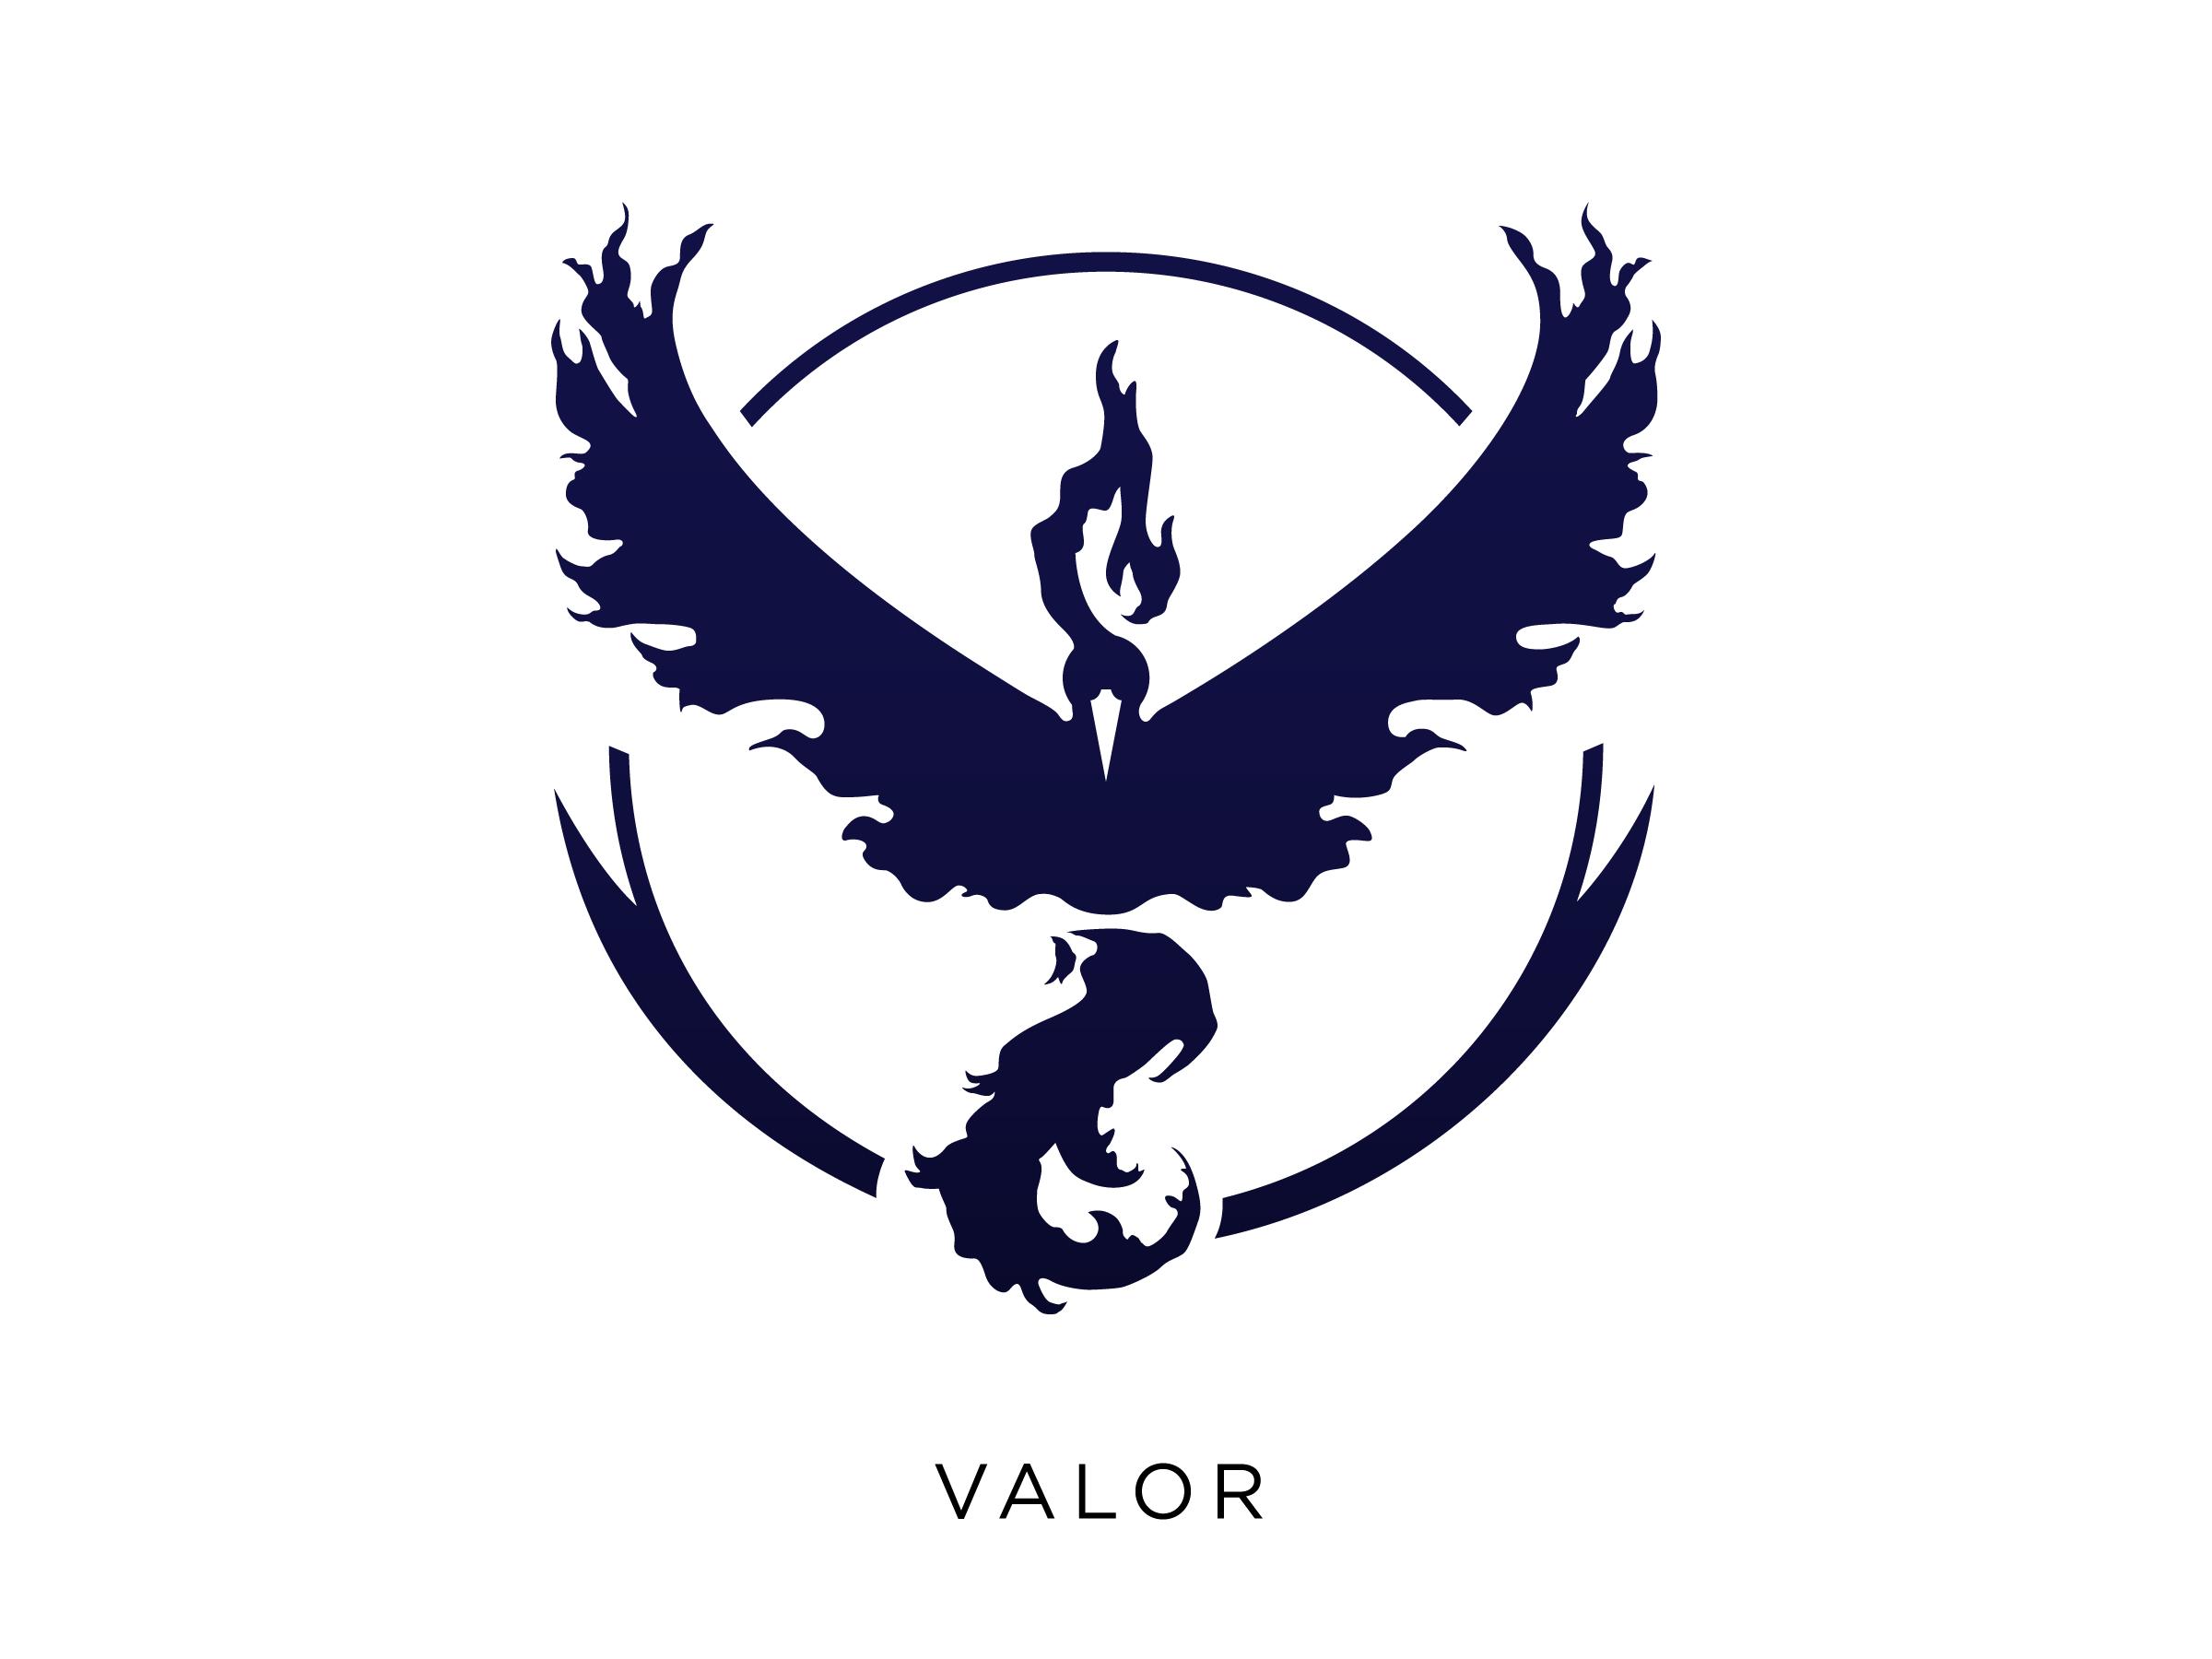 Pokemongo Team Logos Valor Png By Meritt Thomas Vector Logo Pokemon Go Pokemon